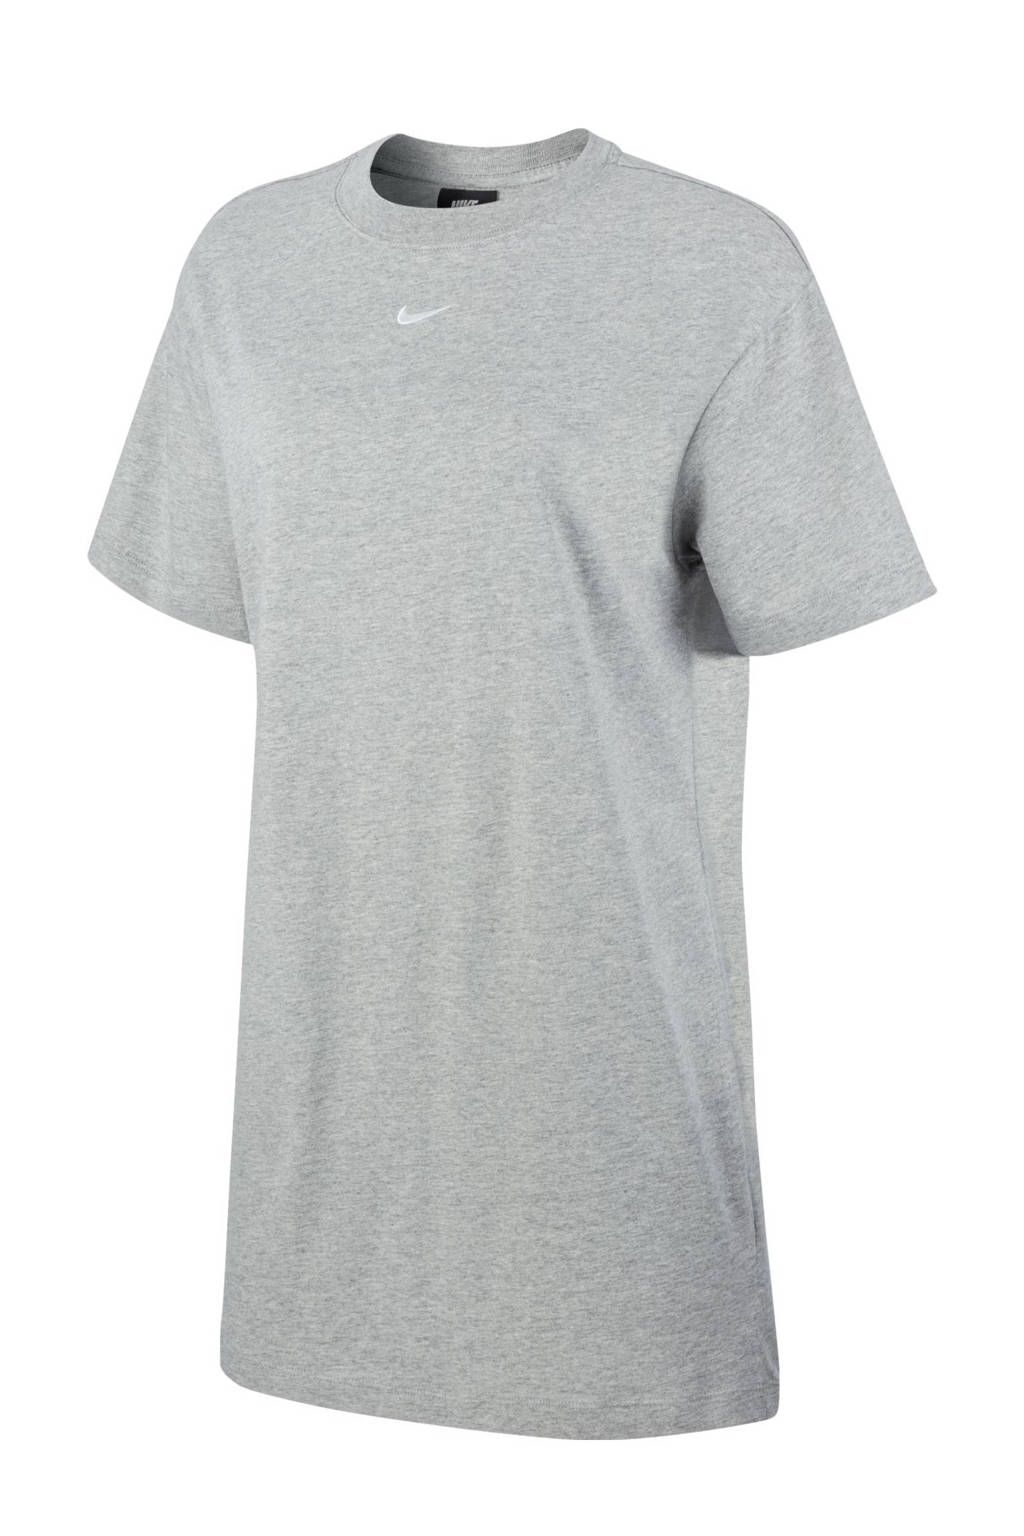 Nike jurk grijs, Grijs